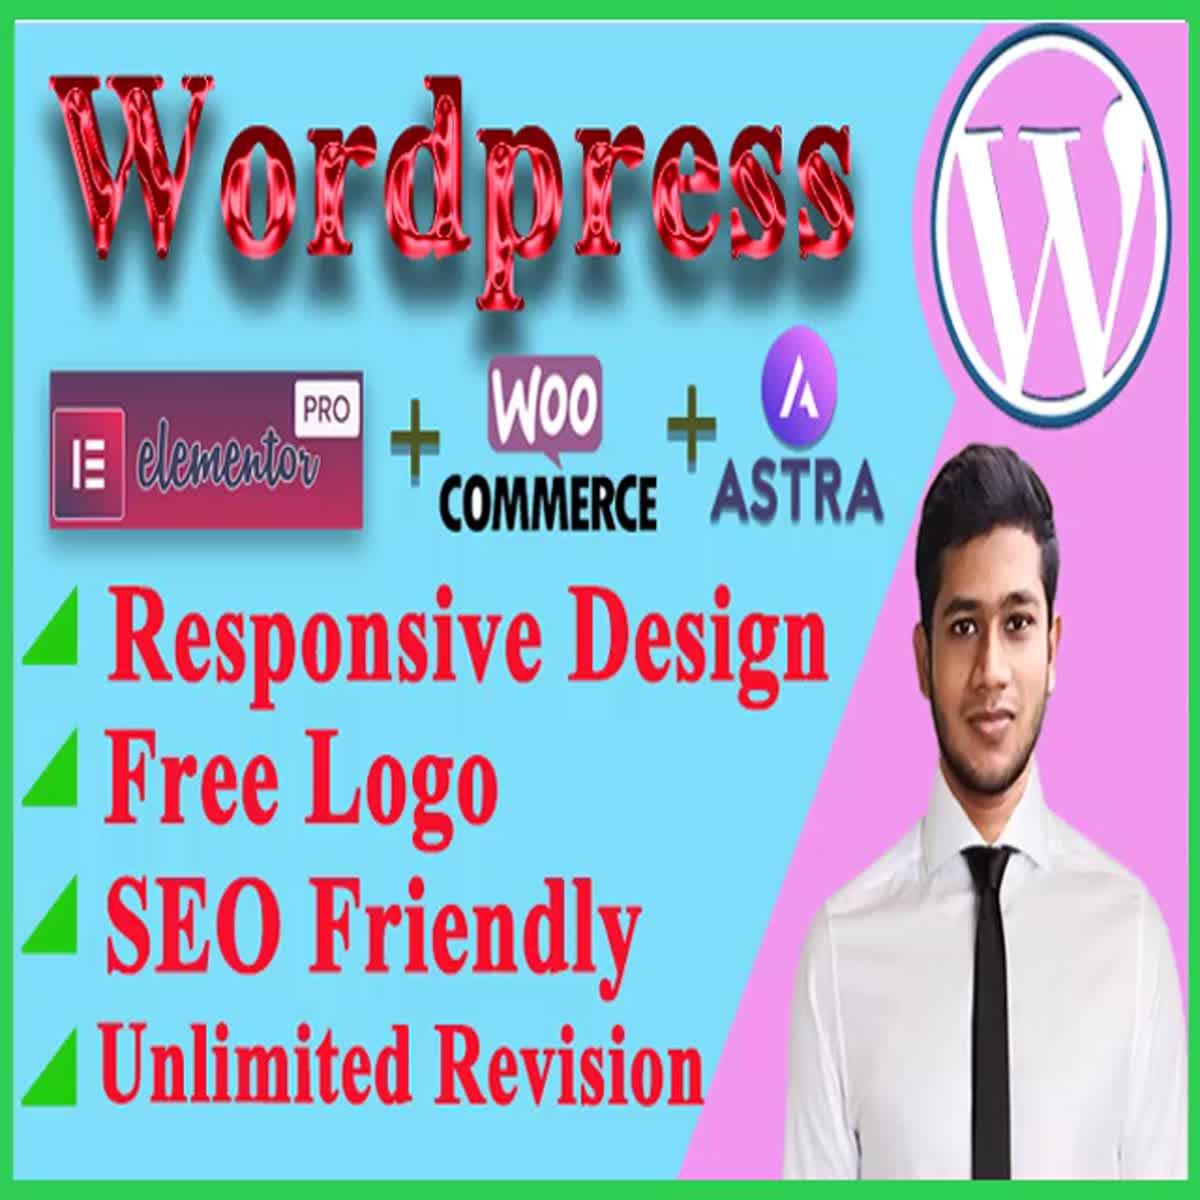 wordpress website design and develop a responsive website or customize website